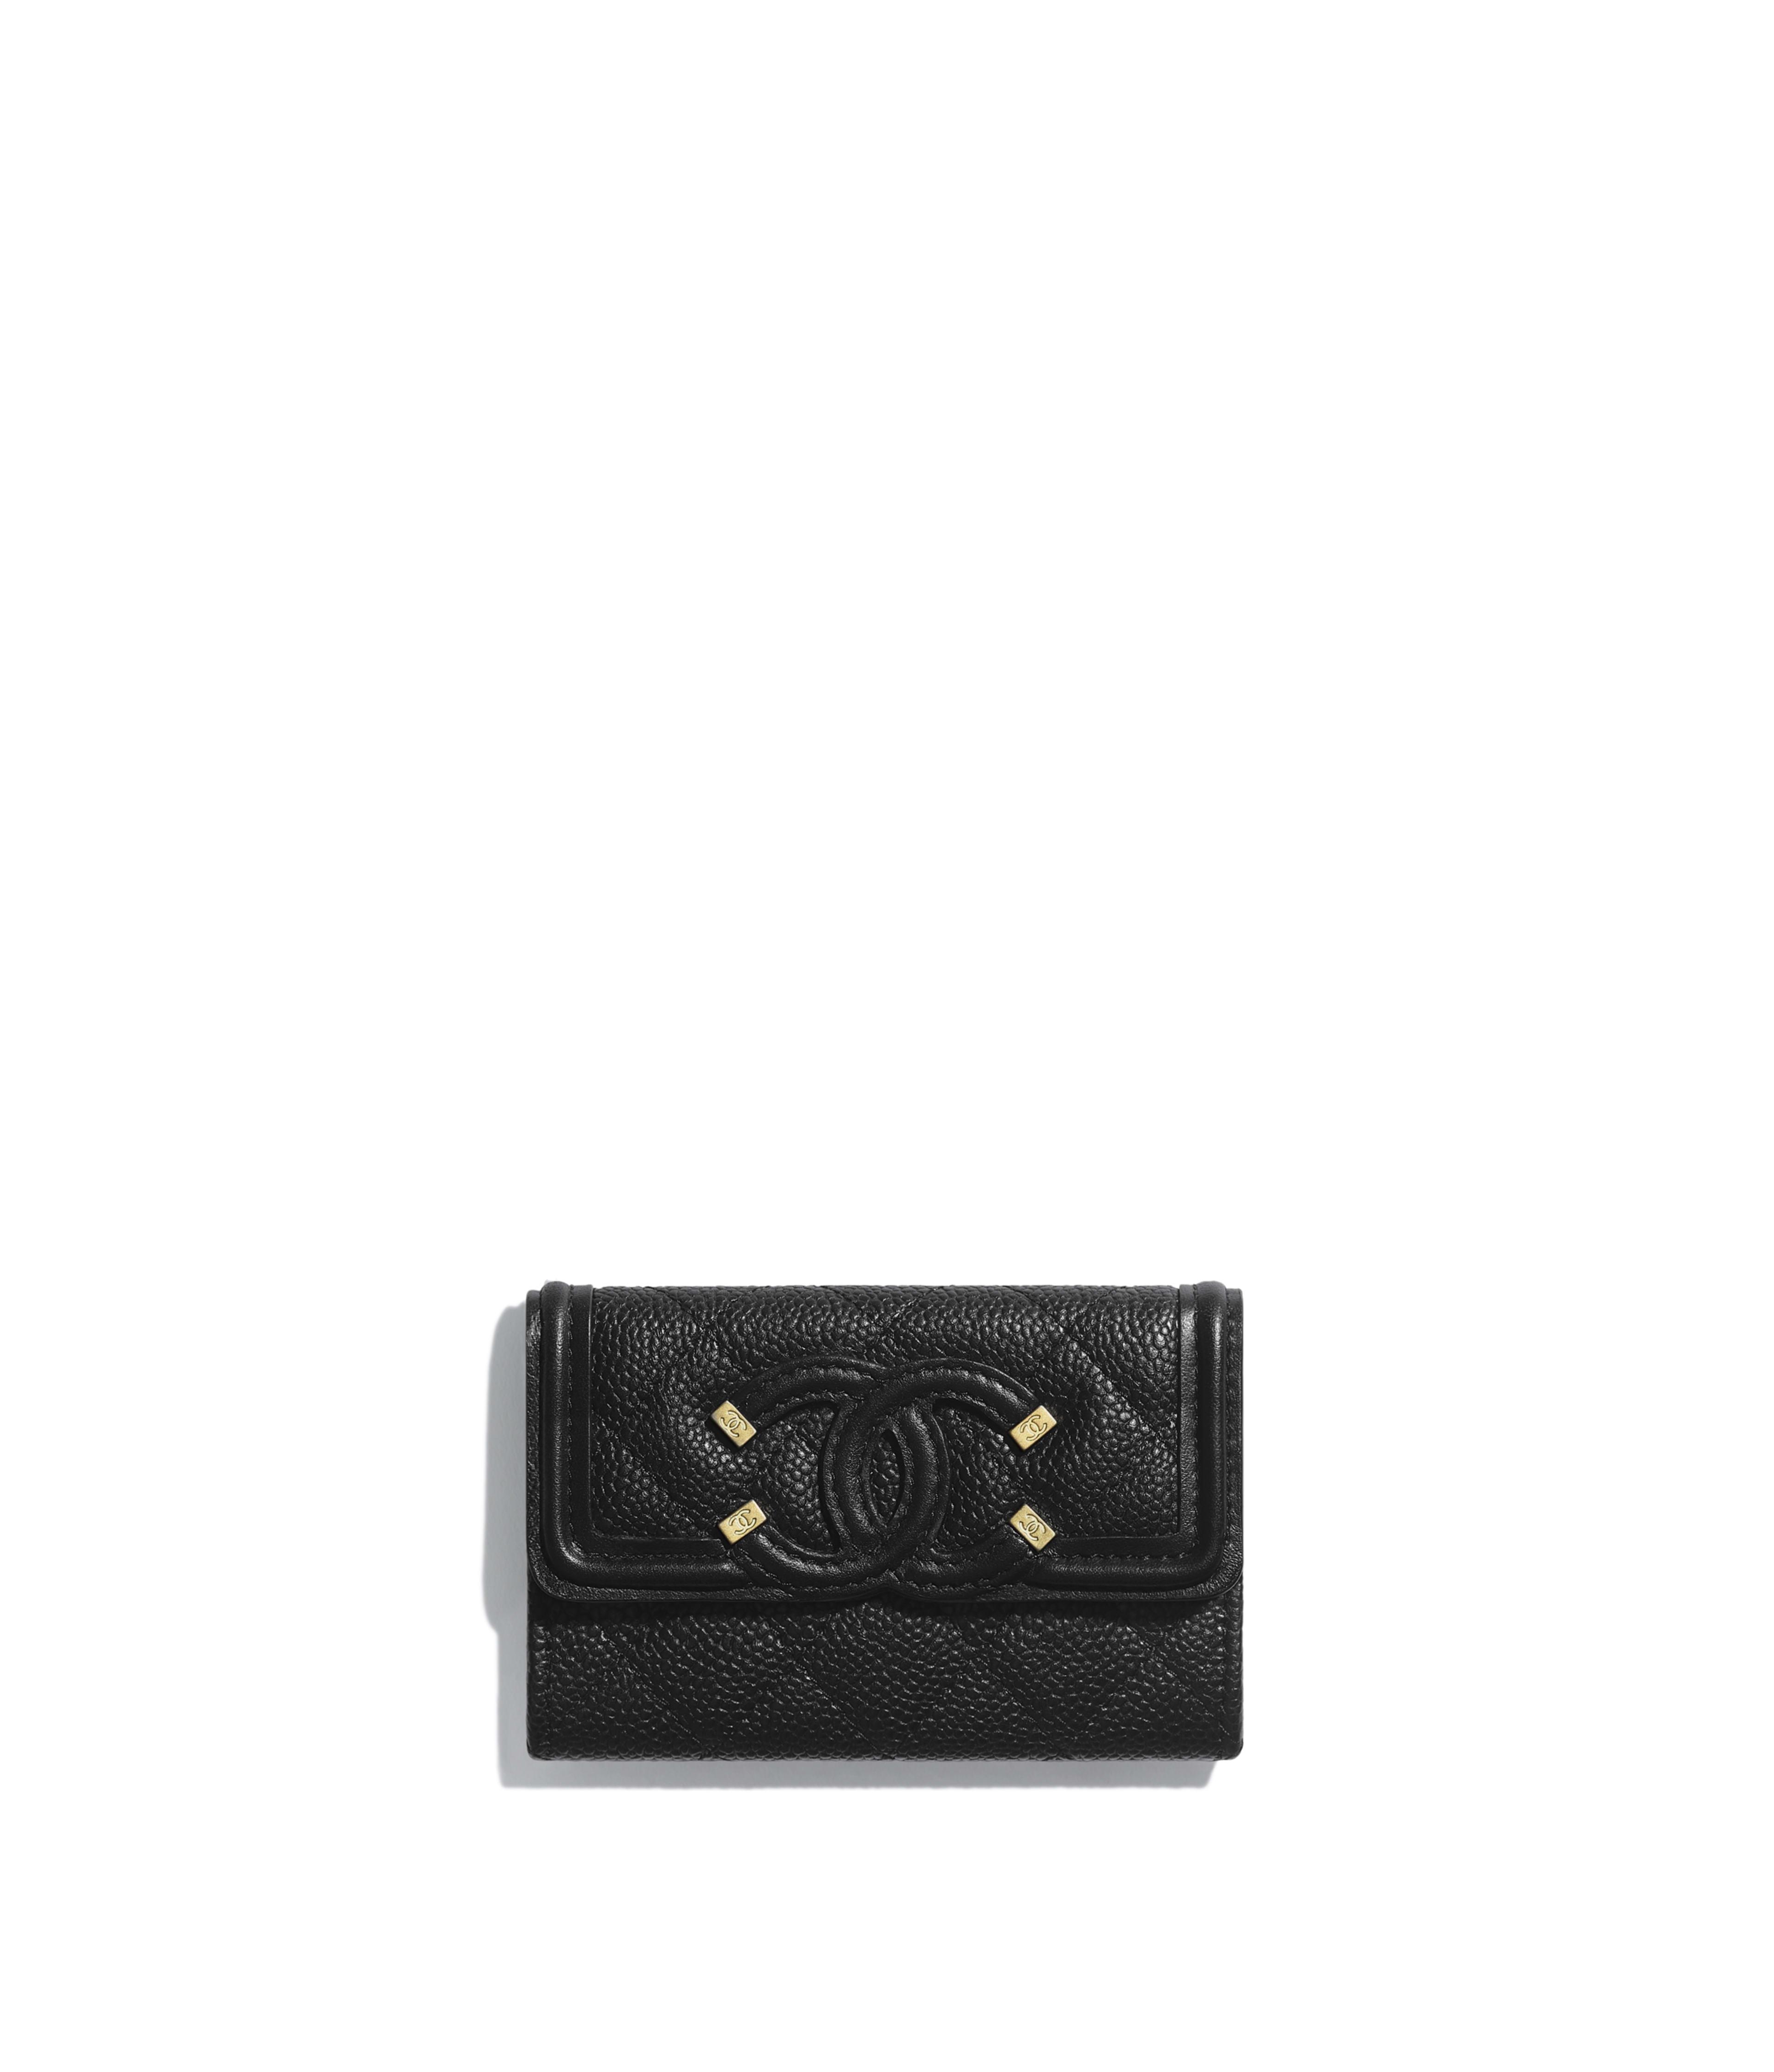 8cbe7975553881 Flap Card Holder Grained Calfskin, Smooth Calfskin & Gold-Tone Metal, Black  Ref. AP0305Y6054294305